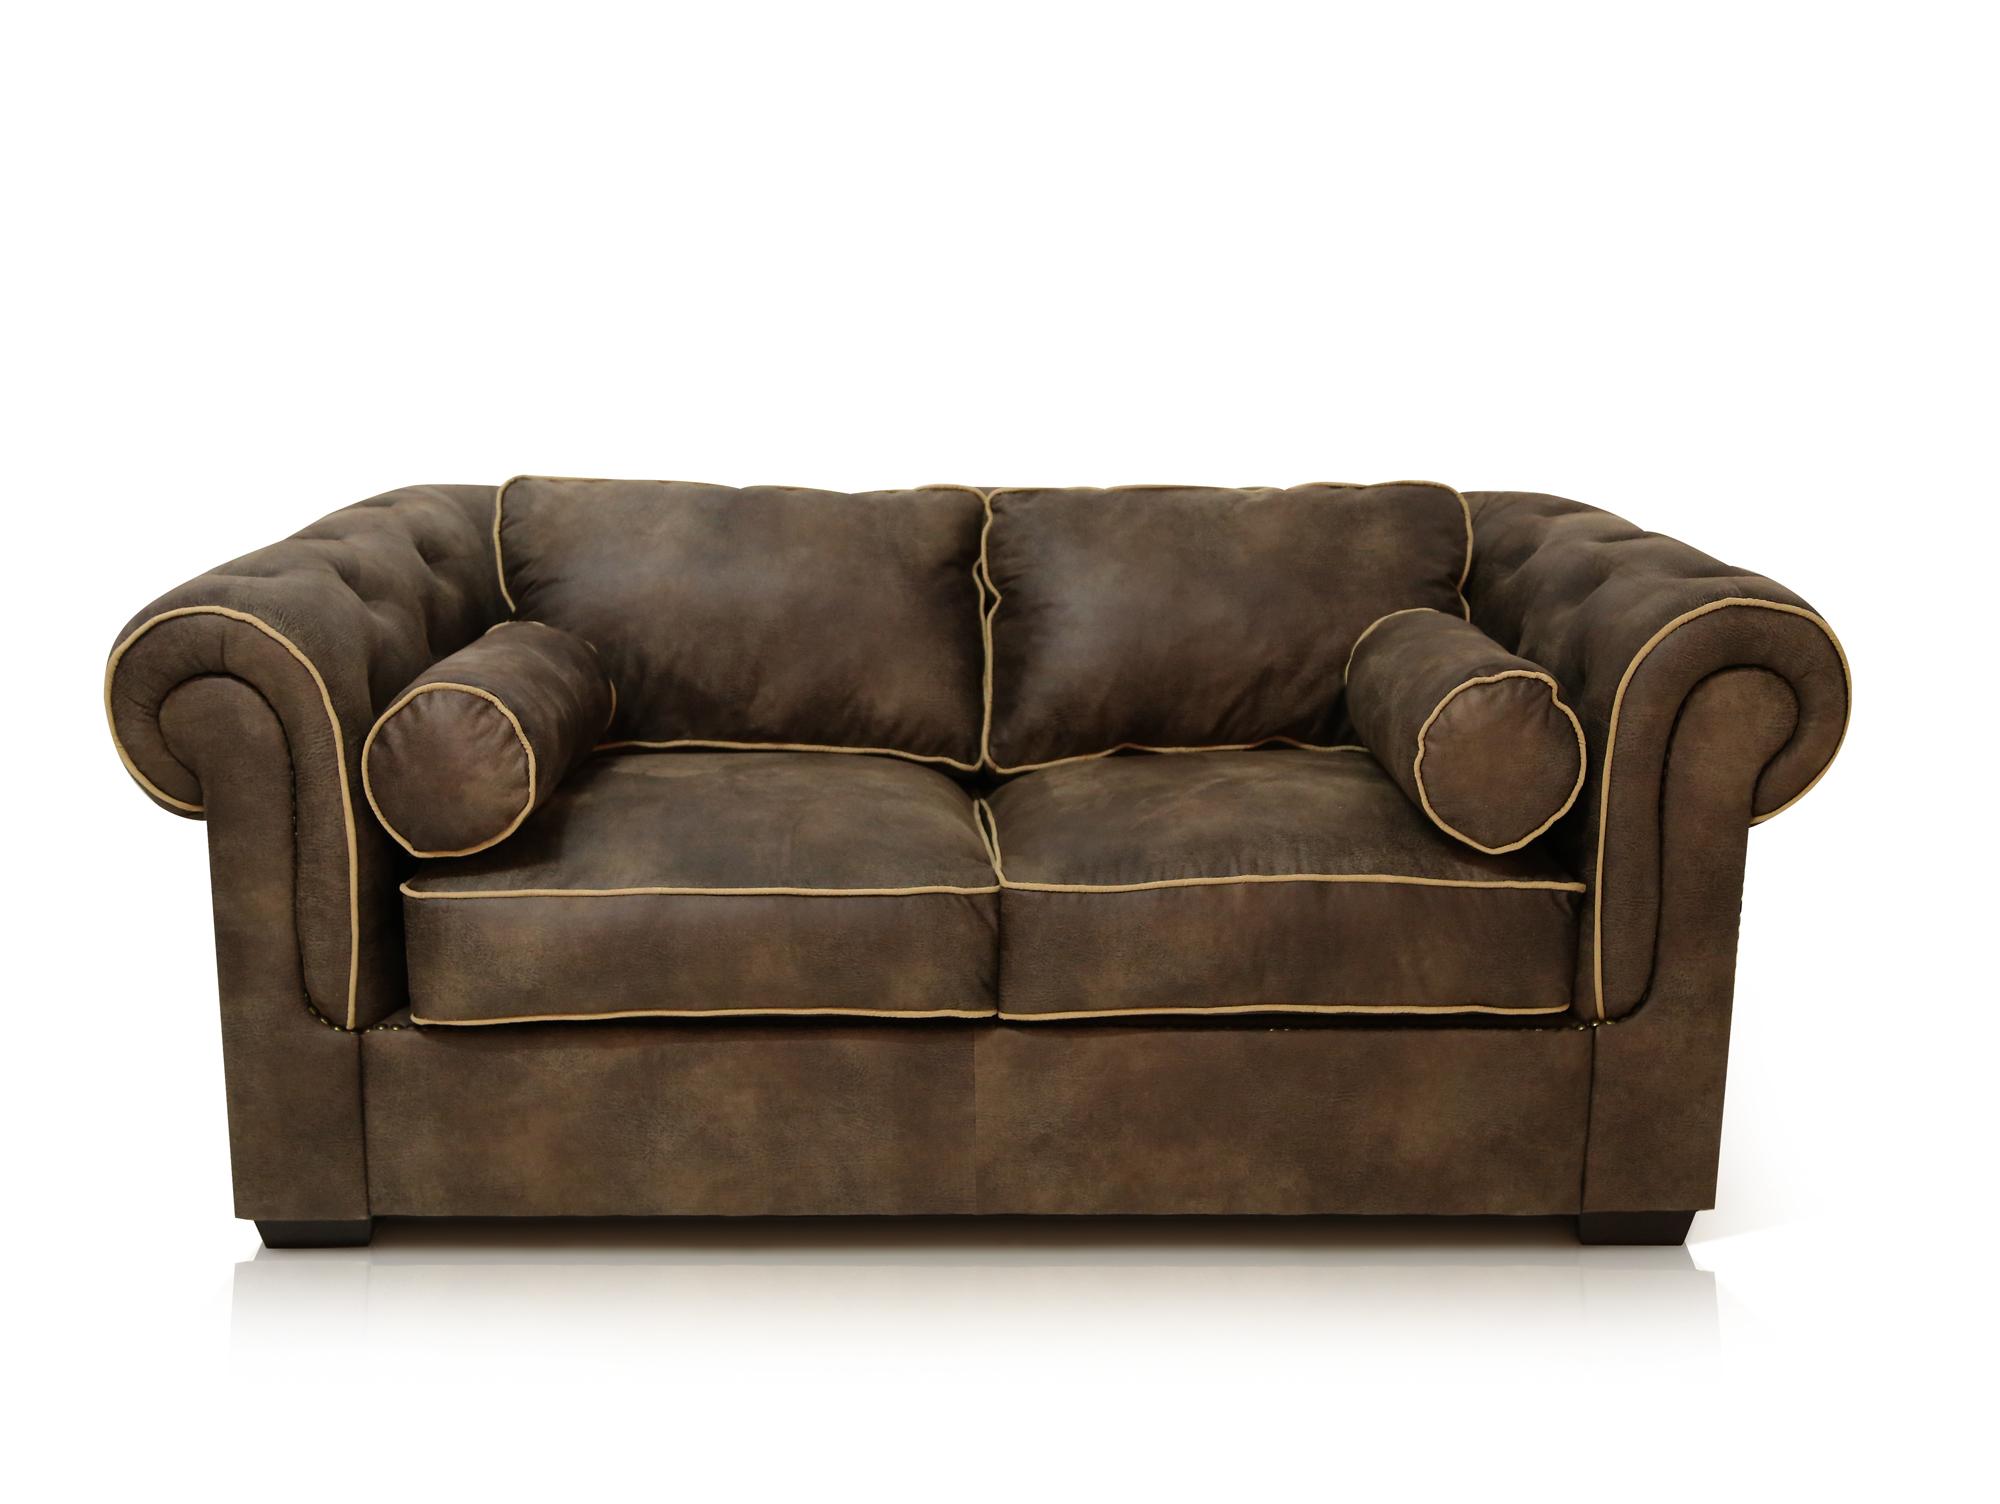 walstar sofa 2 sitzer grau braun. Black Bedroom Furniture Sets. Home Design Ideas